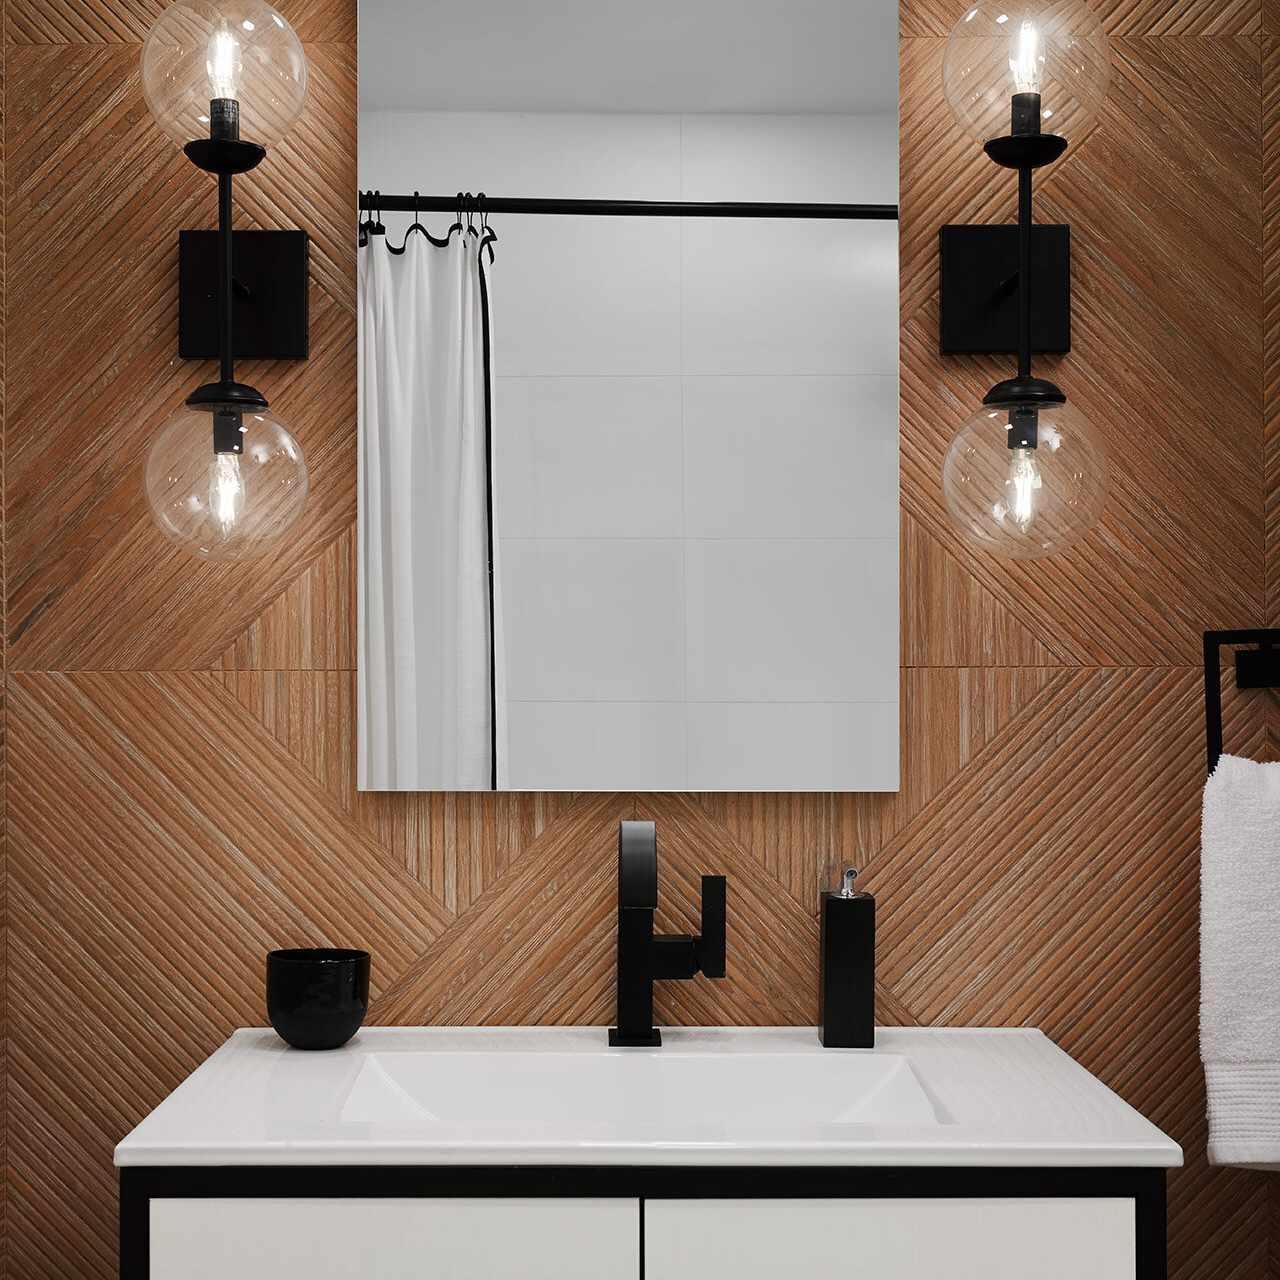 A powder room with wood-paneled walls